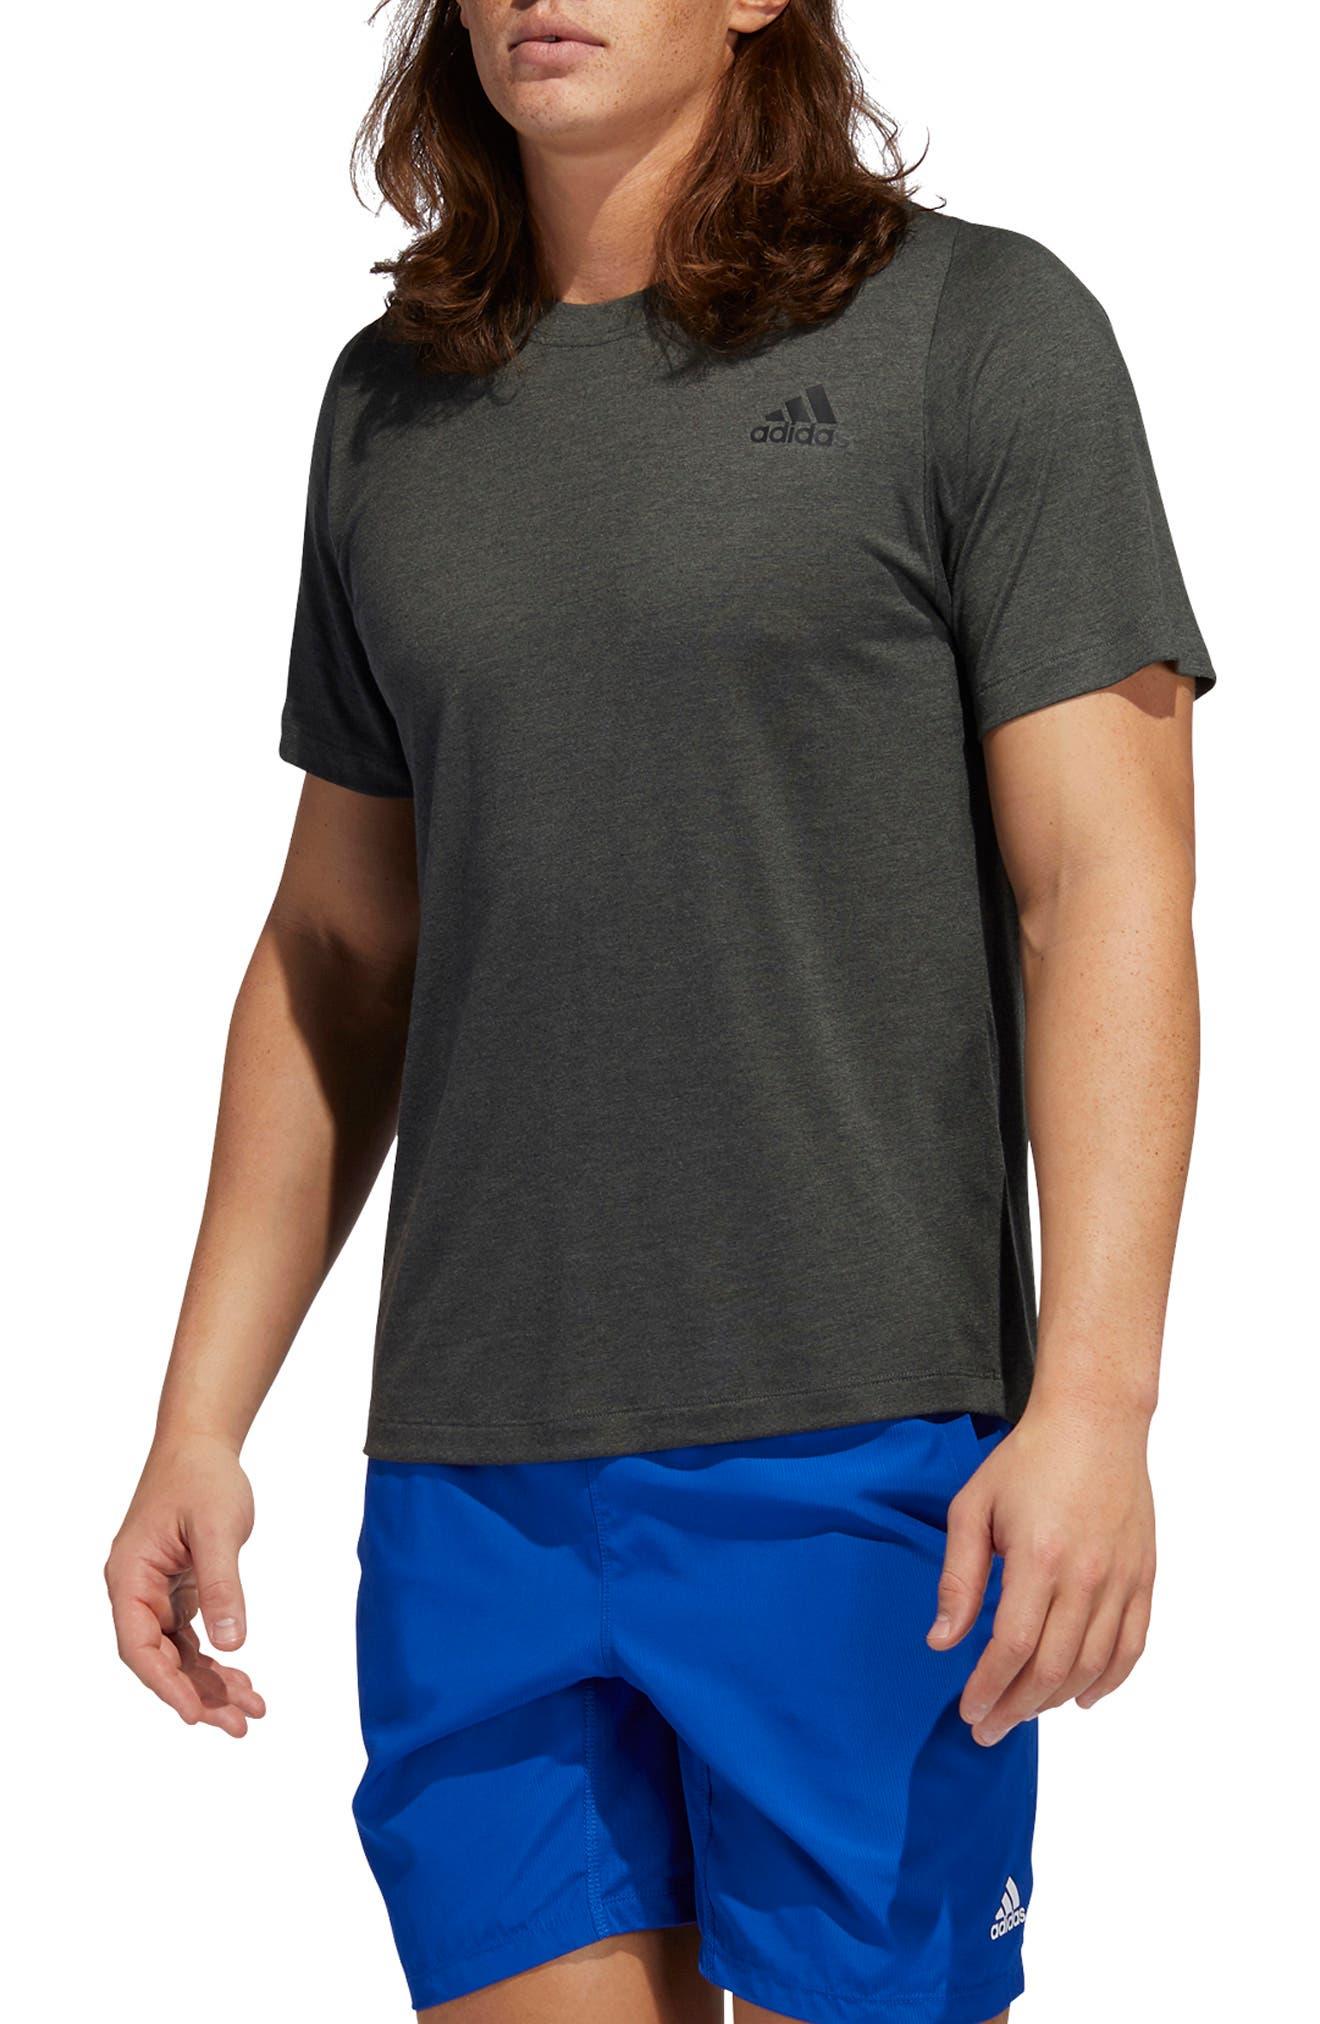 Image of adidas Technical Crewneck T-Shirt